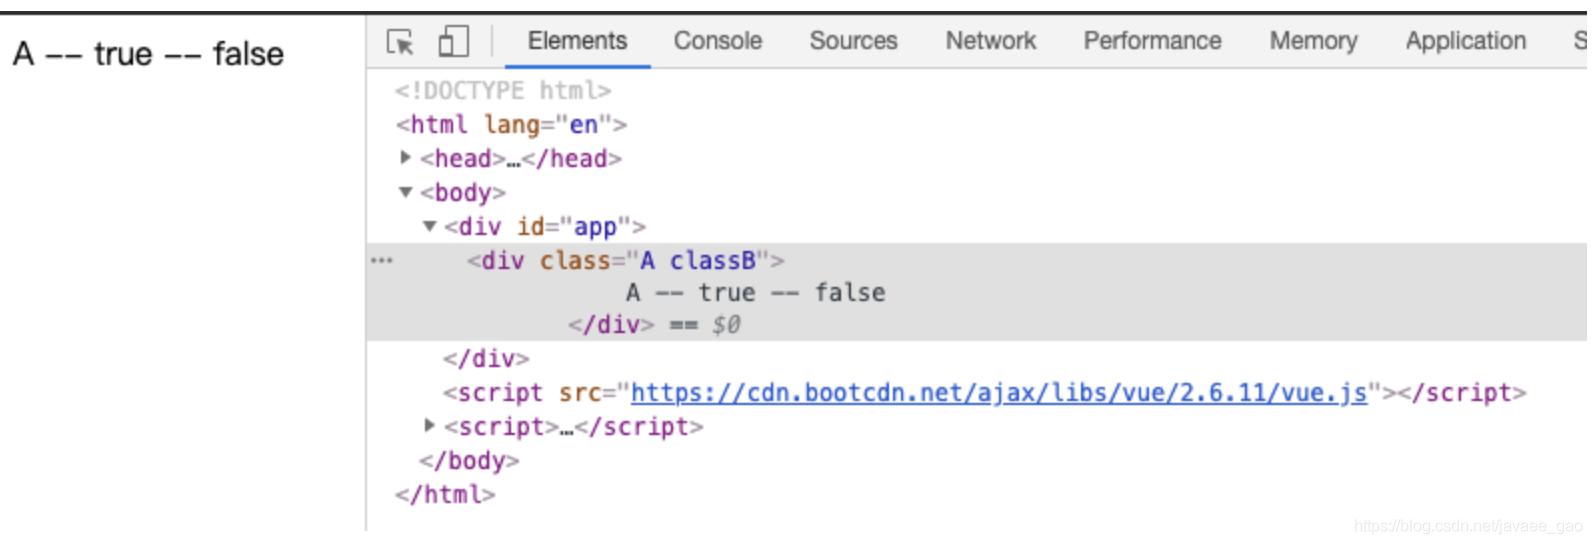 Java程序员入门Vue基础之指令入门学习(三)codegeekgao-